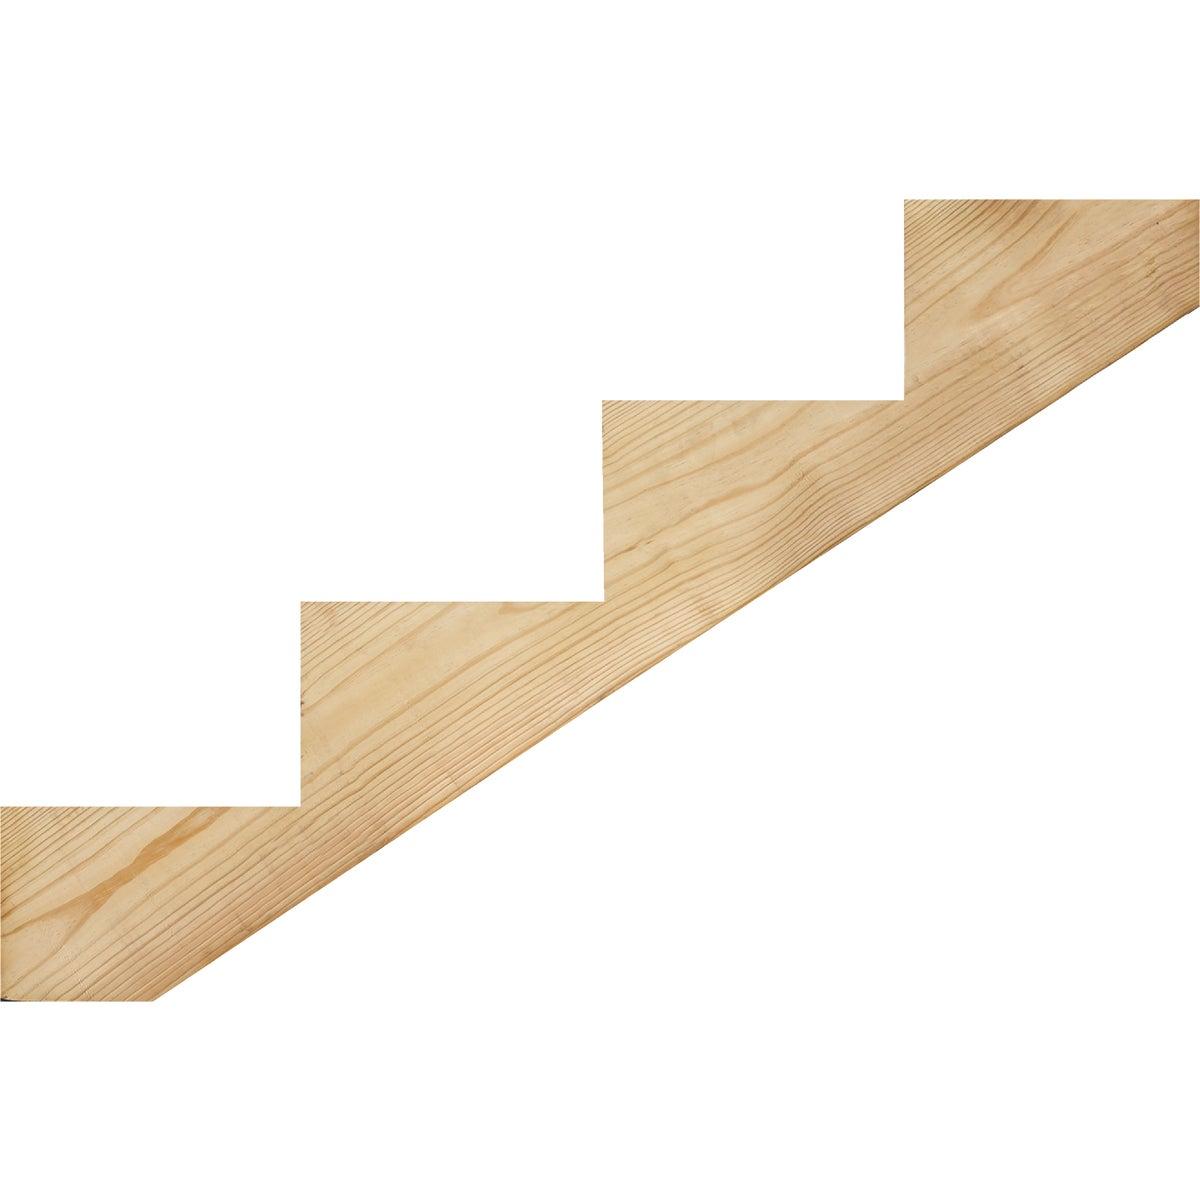 TREATED 4-STEP STRINGER - 1515 by Kitzmans Dixon Llc